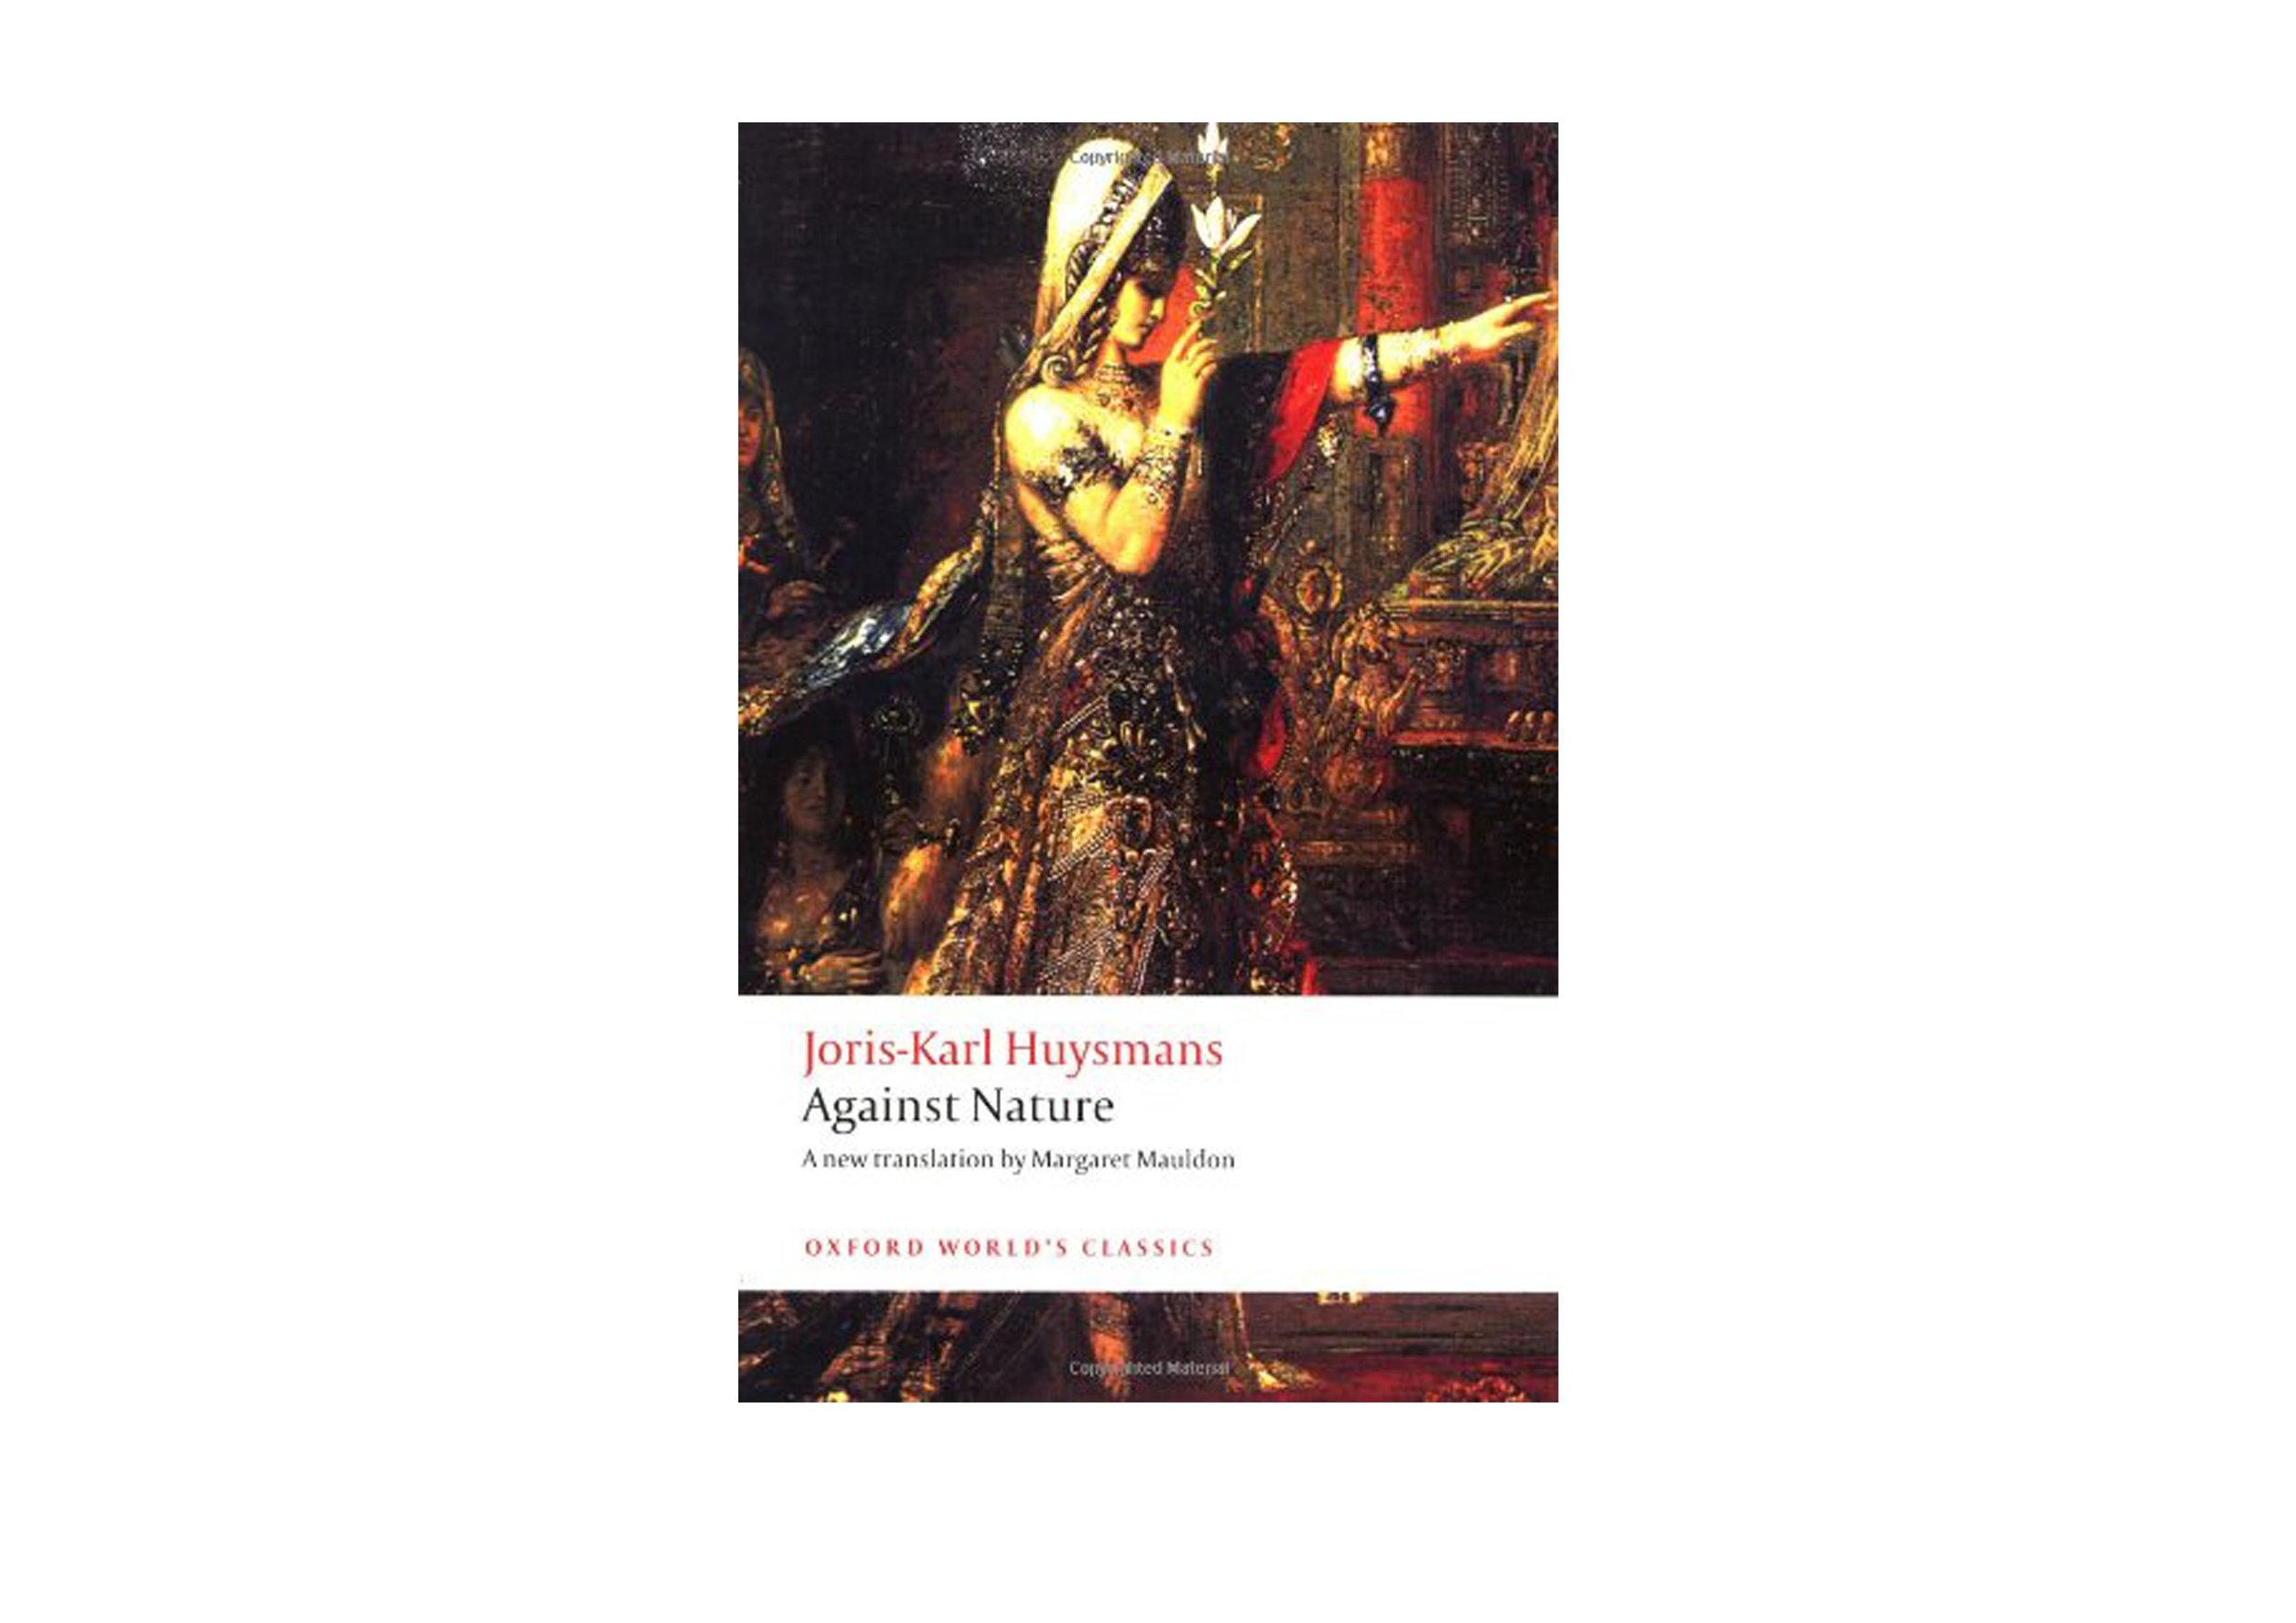 Against Nature  by Joris-Karl Huysmans